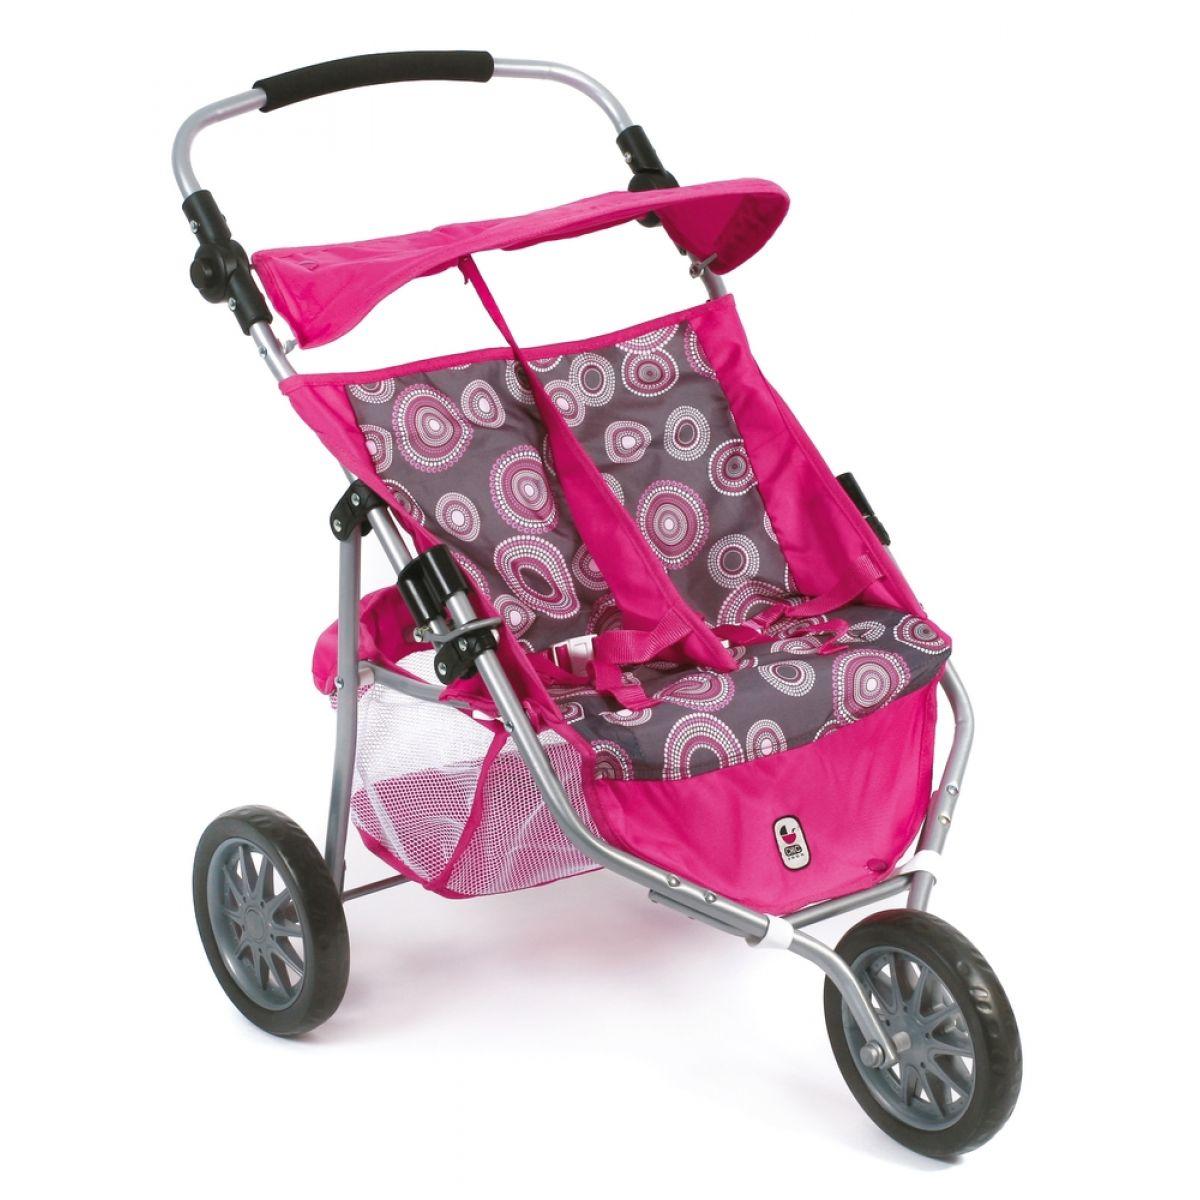 Bayer Chic Kočárek pro panenky Jogger Hot pink pearls